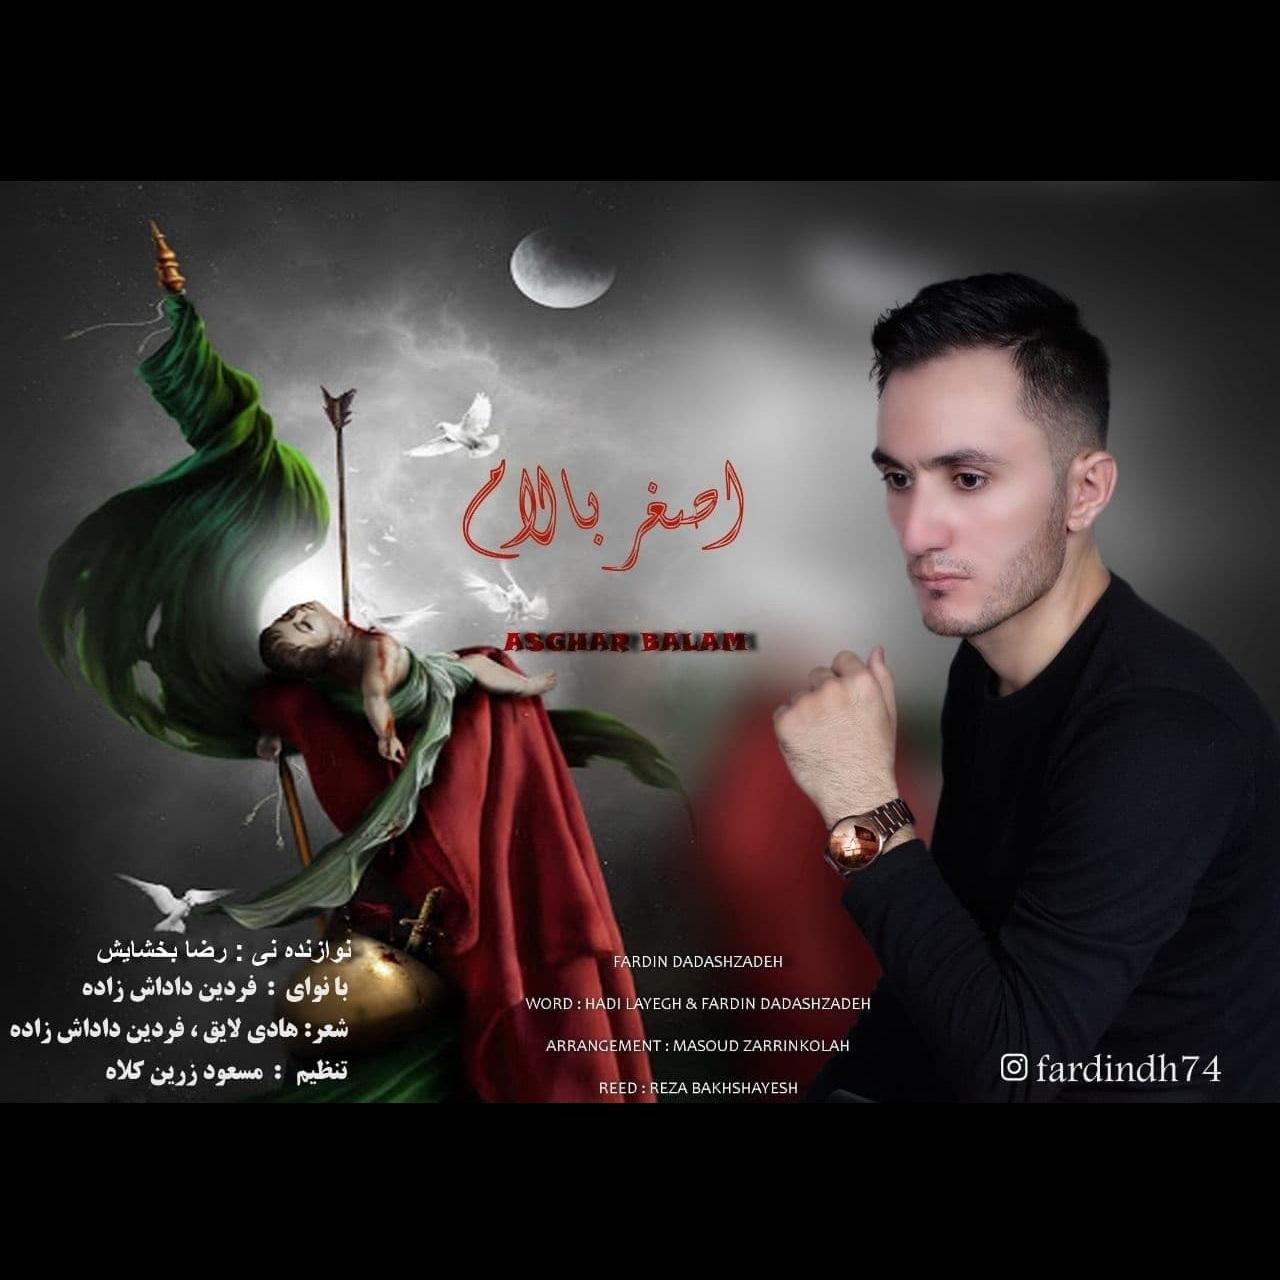 https://s21.picofile.com/file/8441431984/07Fardin_Dadashzadeh_Asghar_Balam.jpg